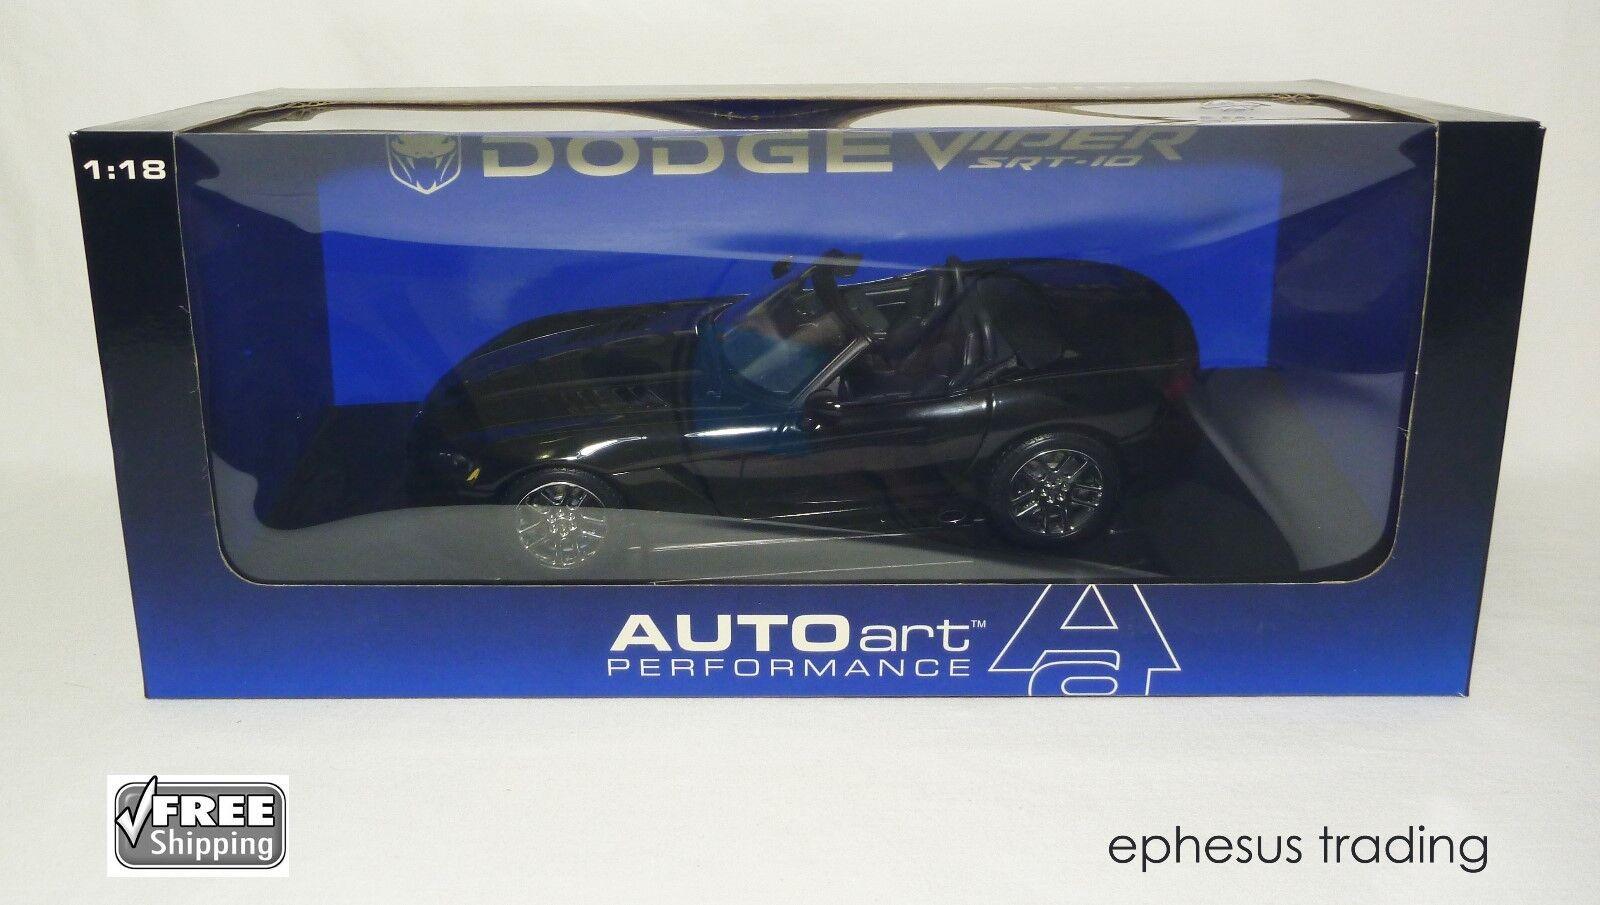 AUTOART Art 2003 DODGE VIPER SRT-10 Roadster Prougeotype 8.3 L V10 noir 1 18 Comme neuf